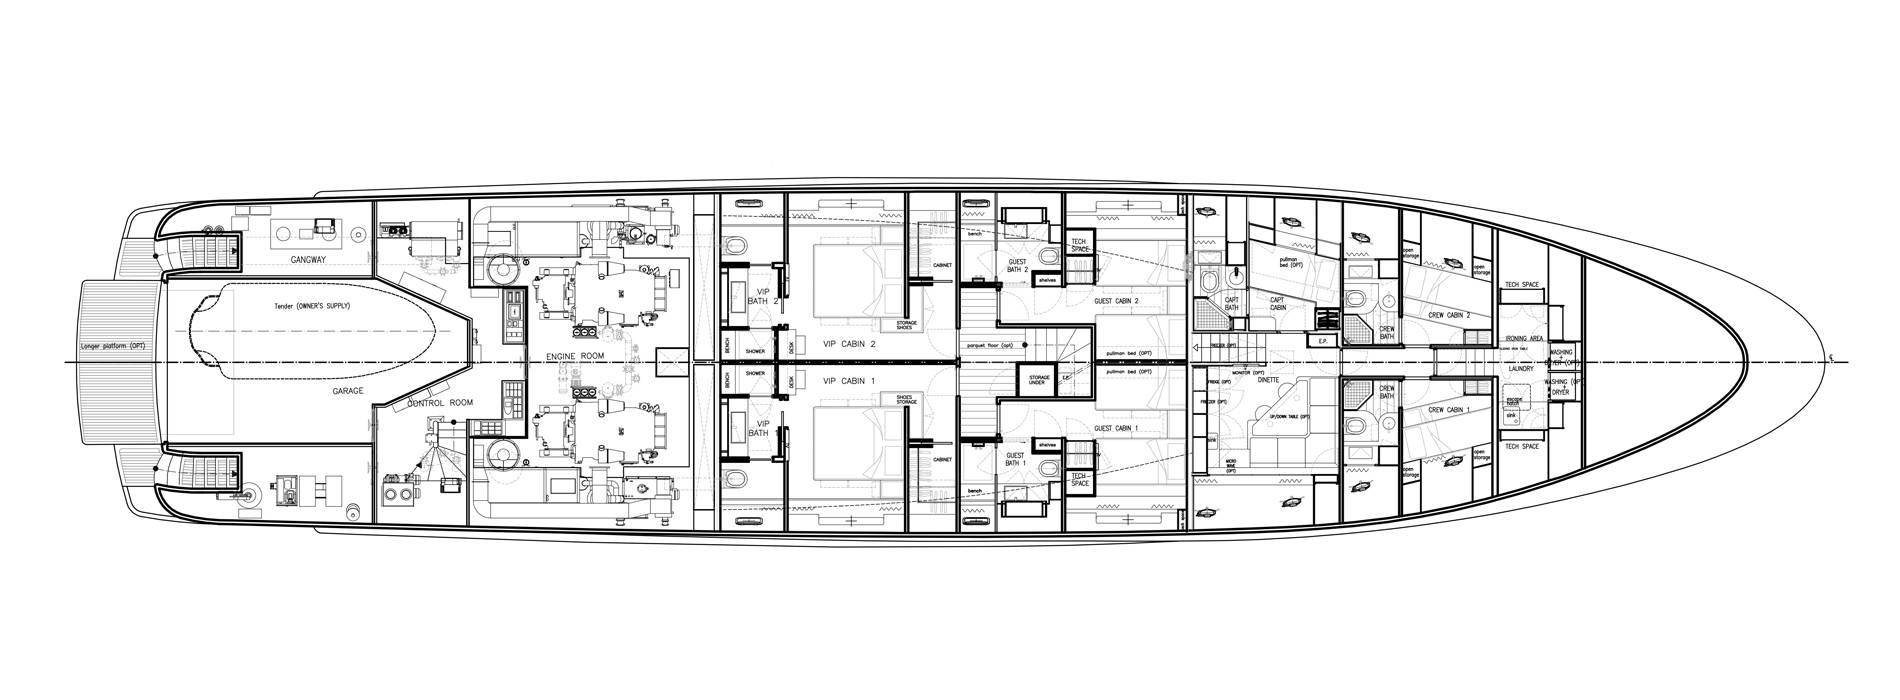 Sanlorenzo Yachts SD122-27 under offer Нижняя палуба